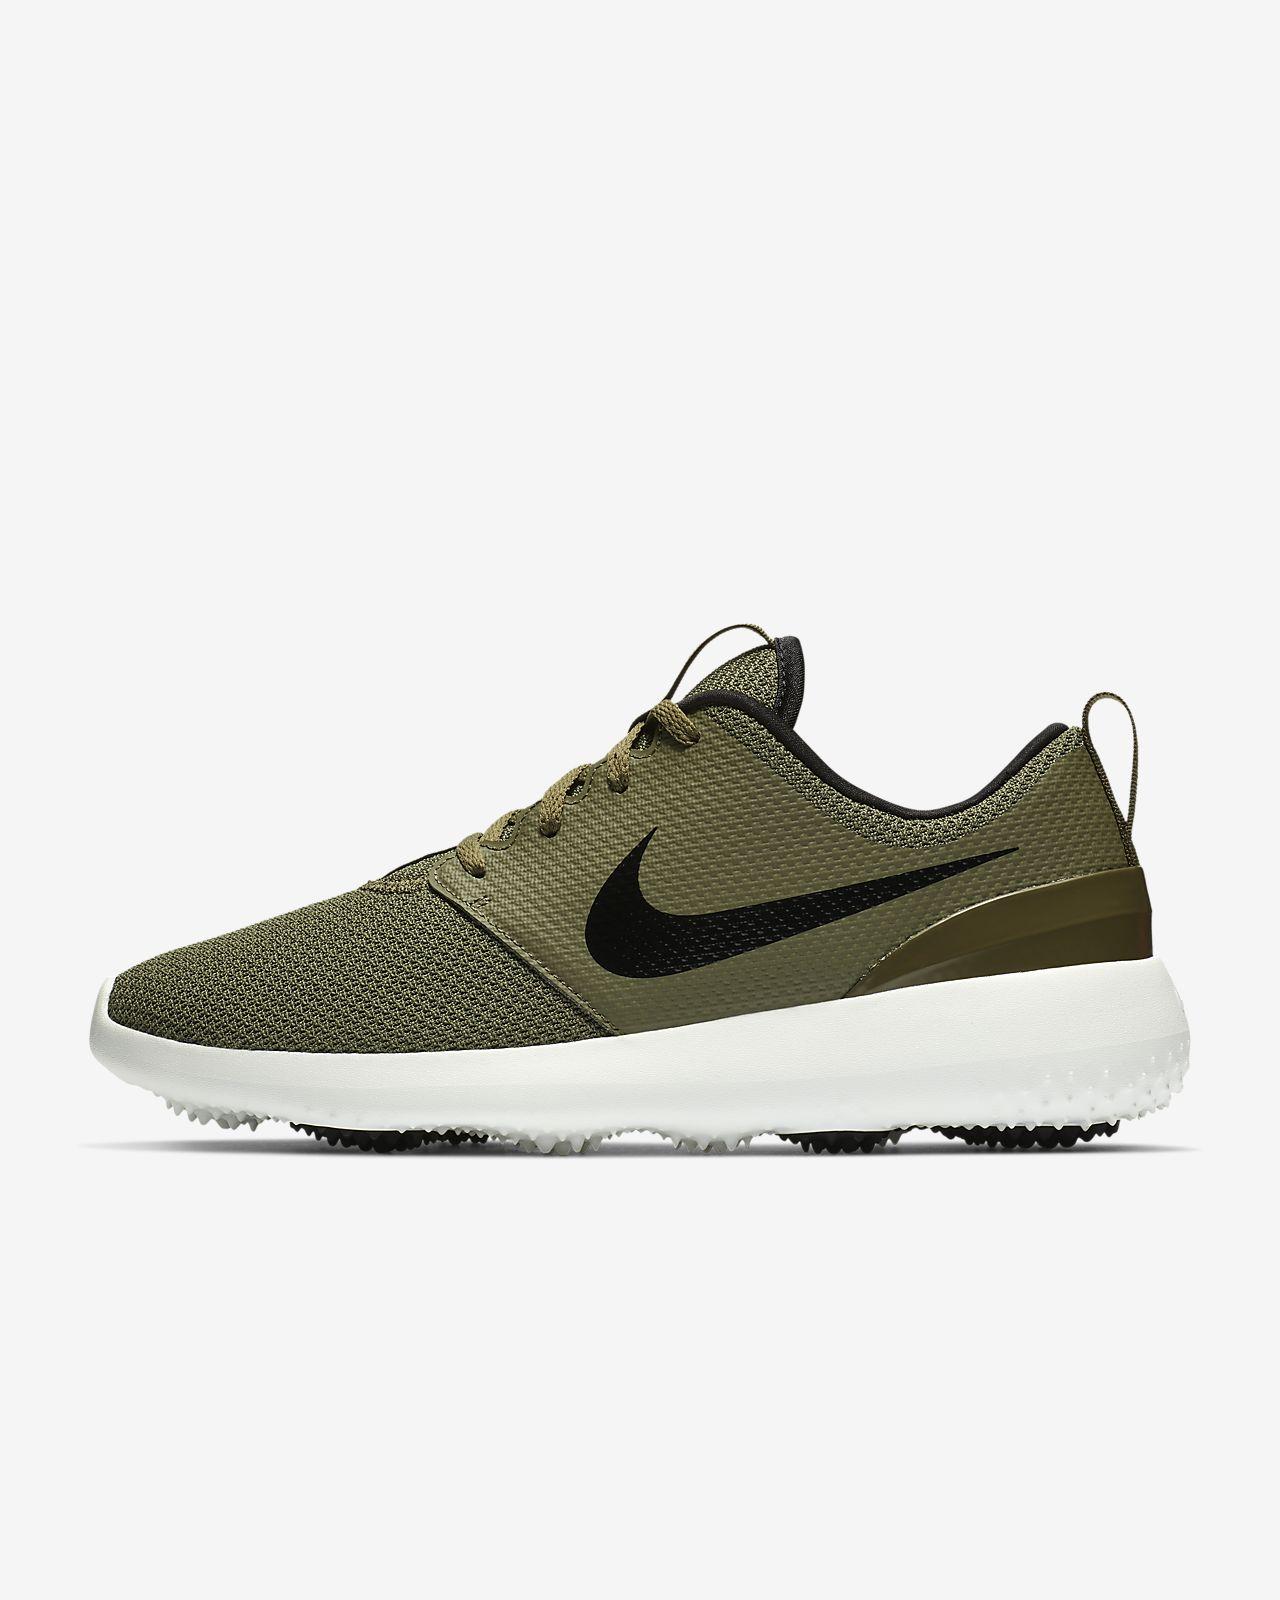 newest 2a30e 4982c ... Nike Roshe G Herren-Golfschuh